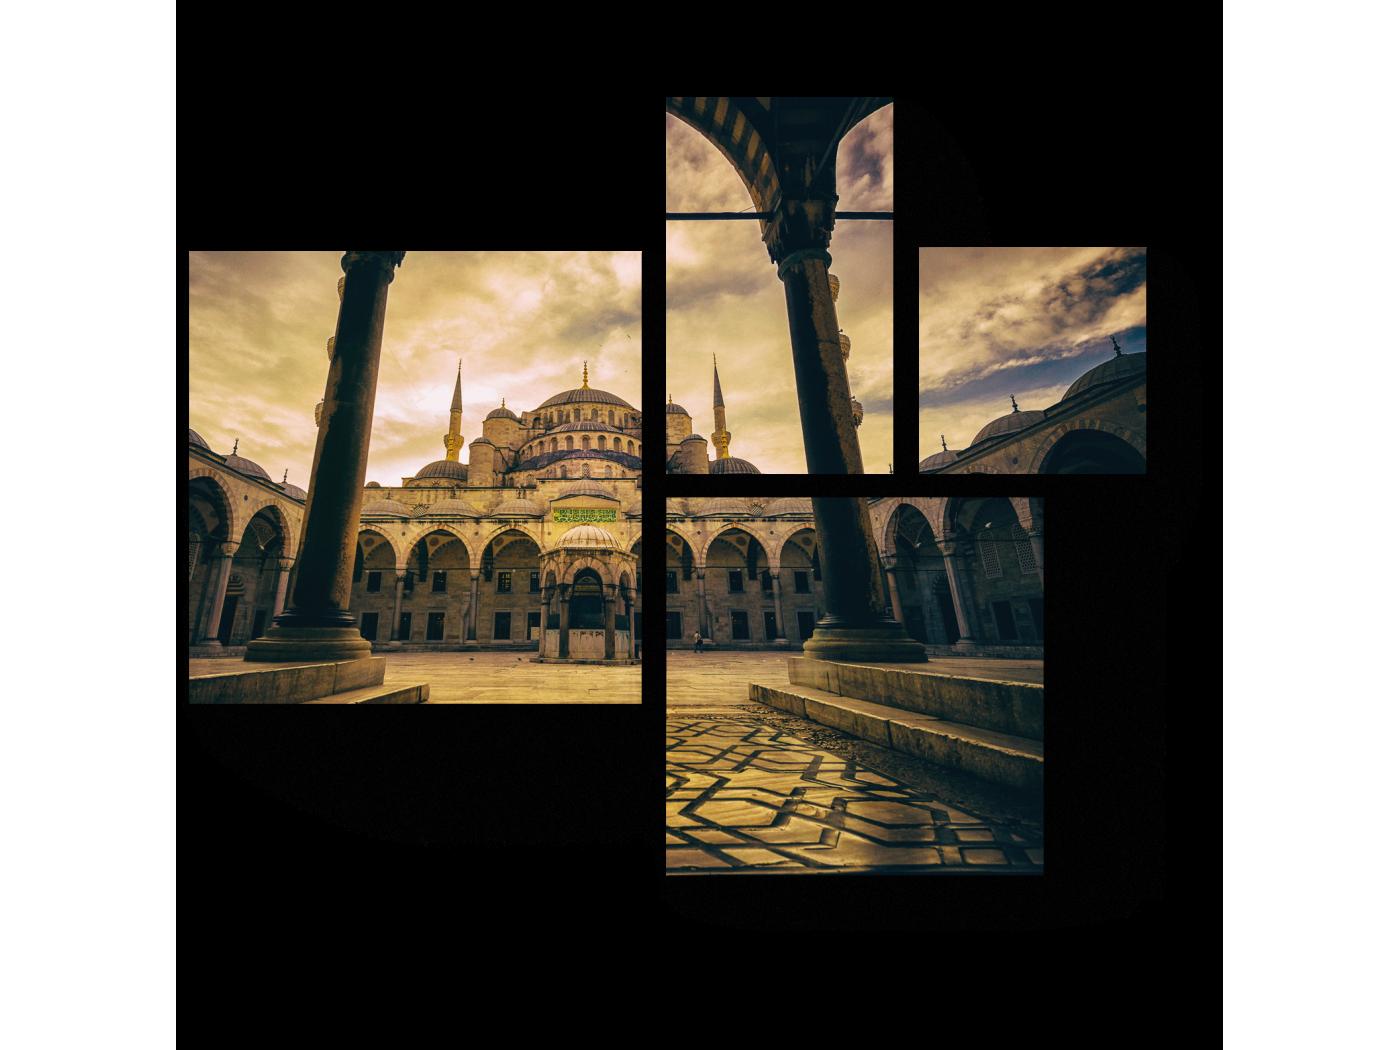 Модульная картина Мечеть в пасмурную погоду (72x60) фото